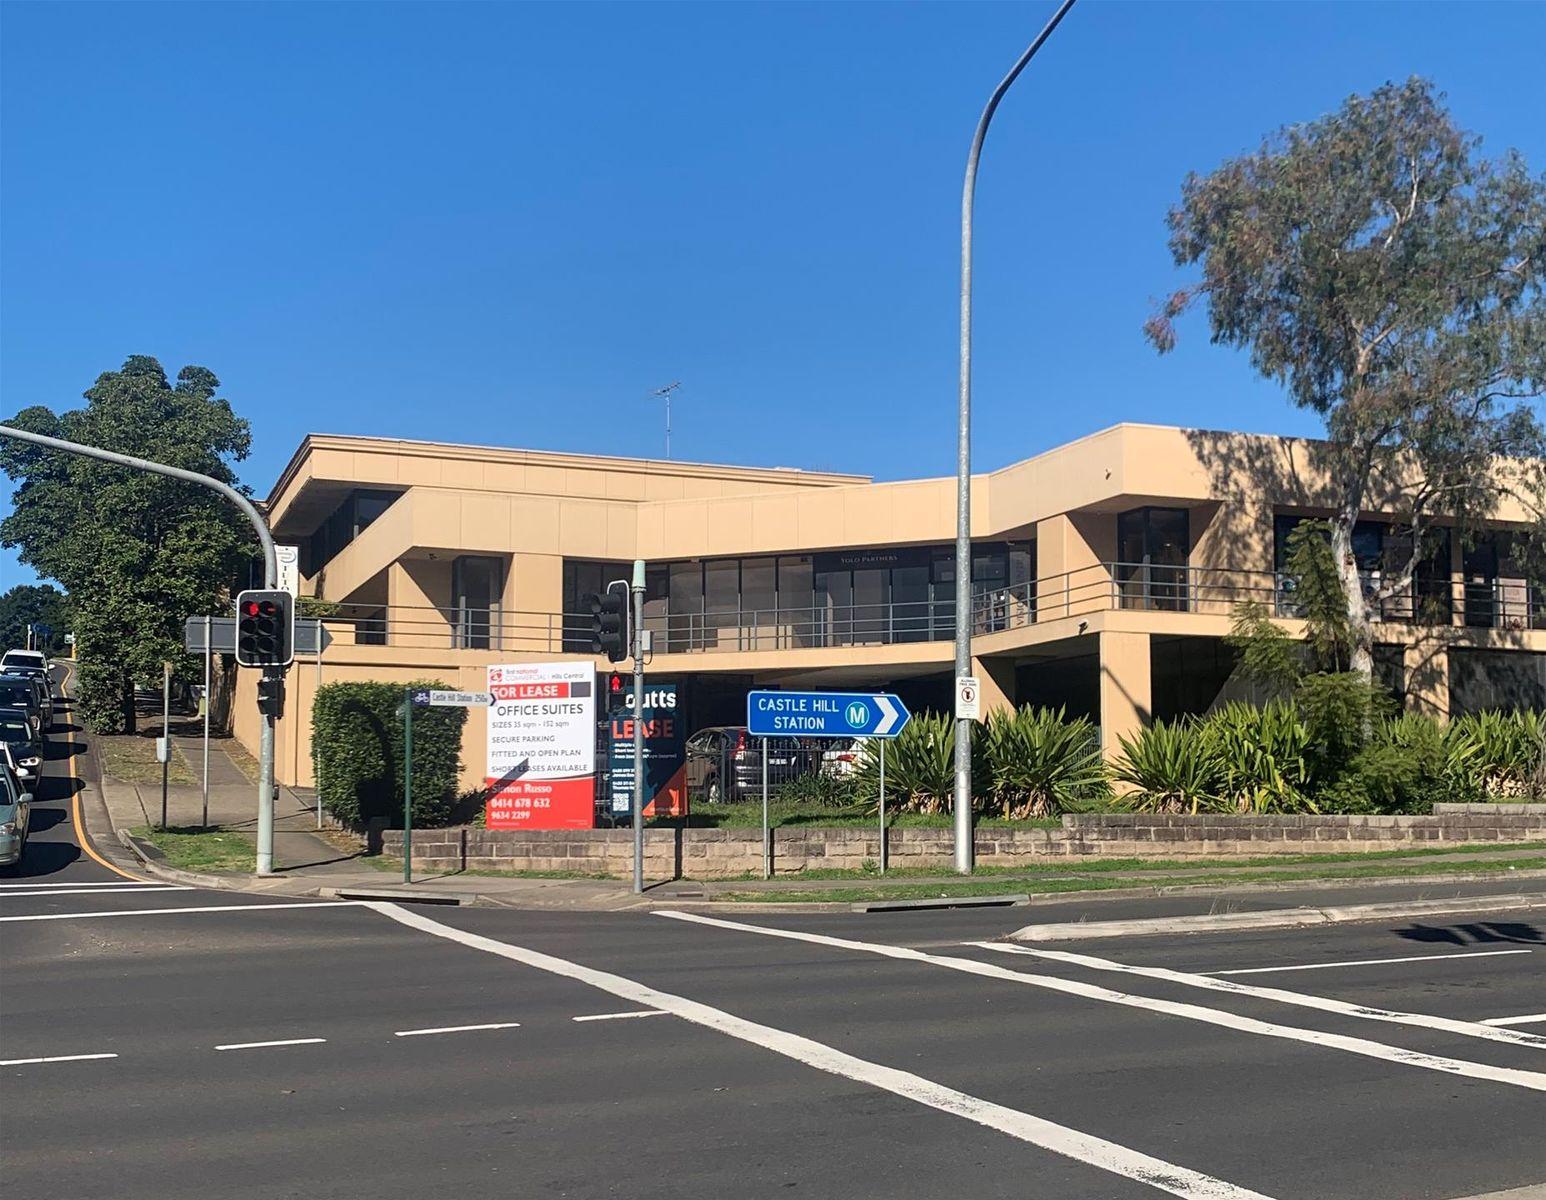 30/10-12 Old Castle Hill Road, Castle Hill, NSW 2154